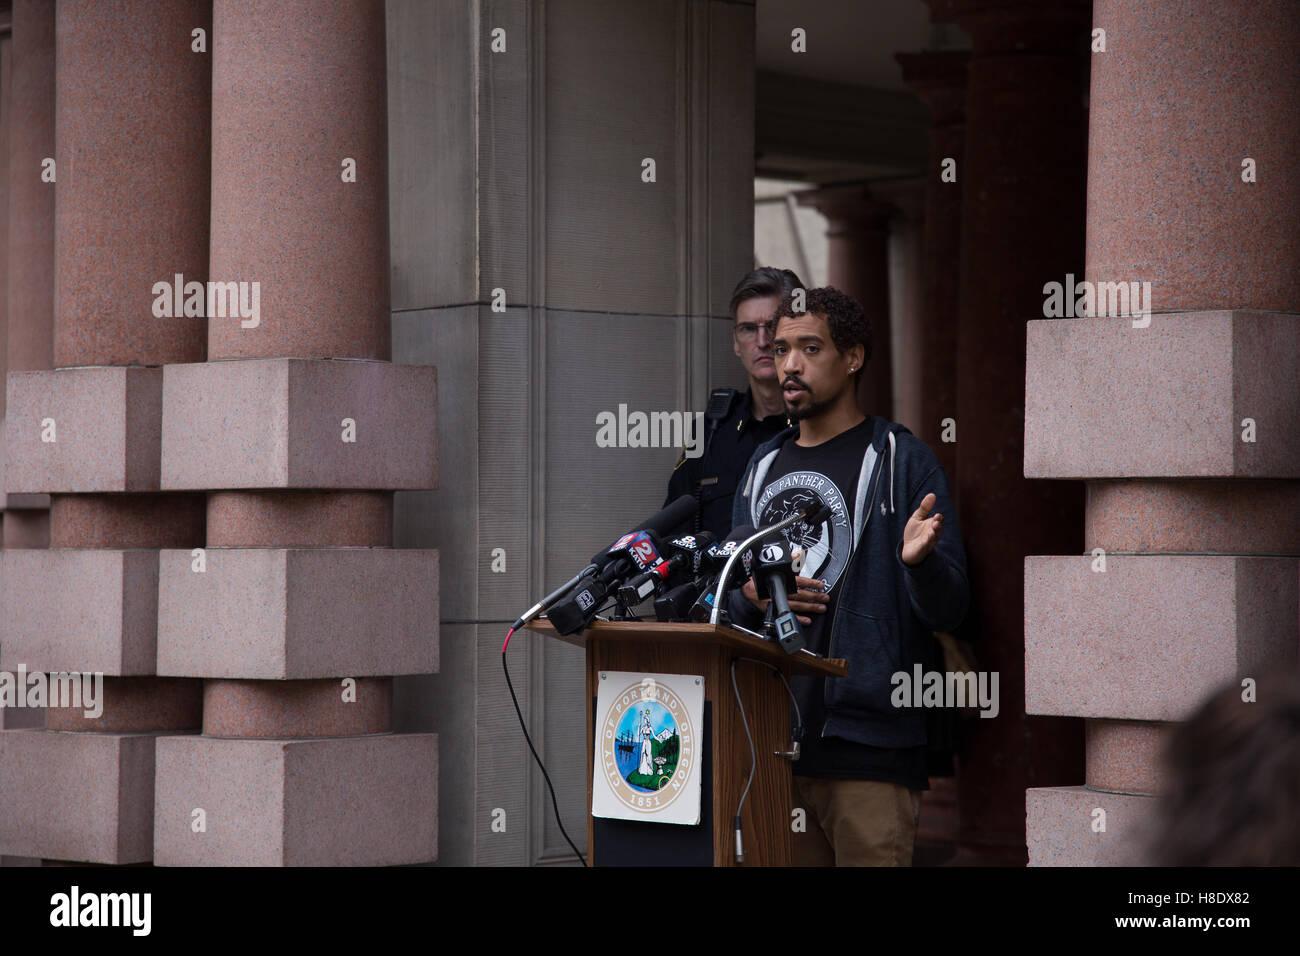 Portland, USA. 11th November, 2016. Portland Oregon 'Not My President' protest organizer speaks during a - Stock Image